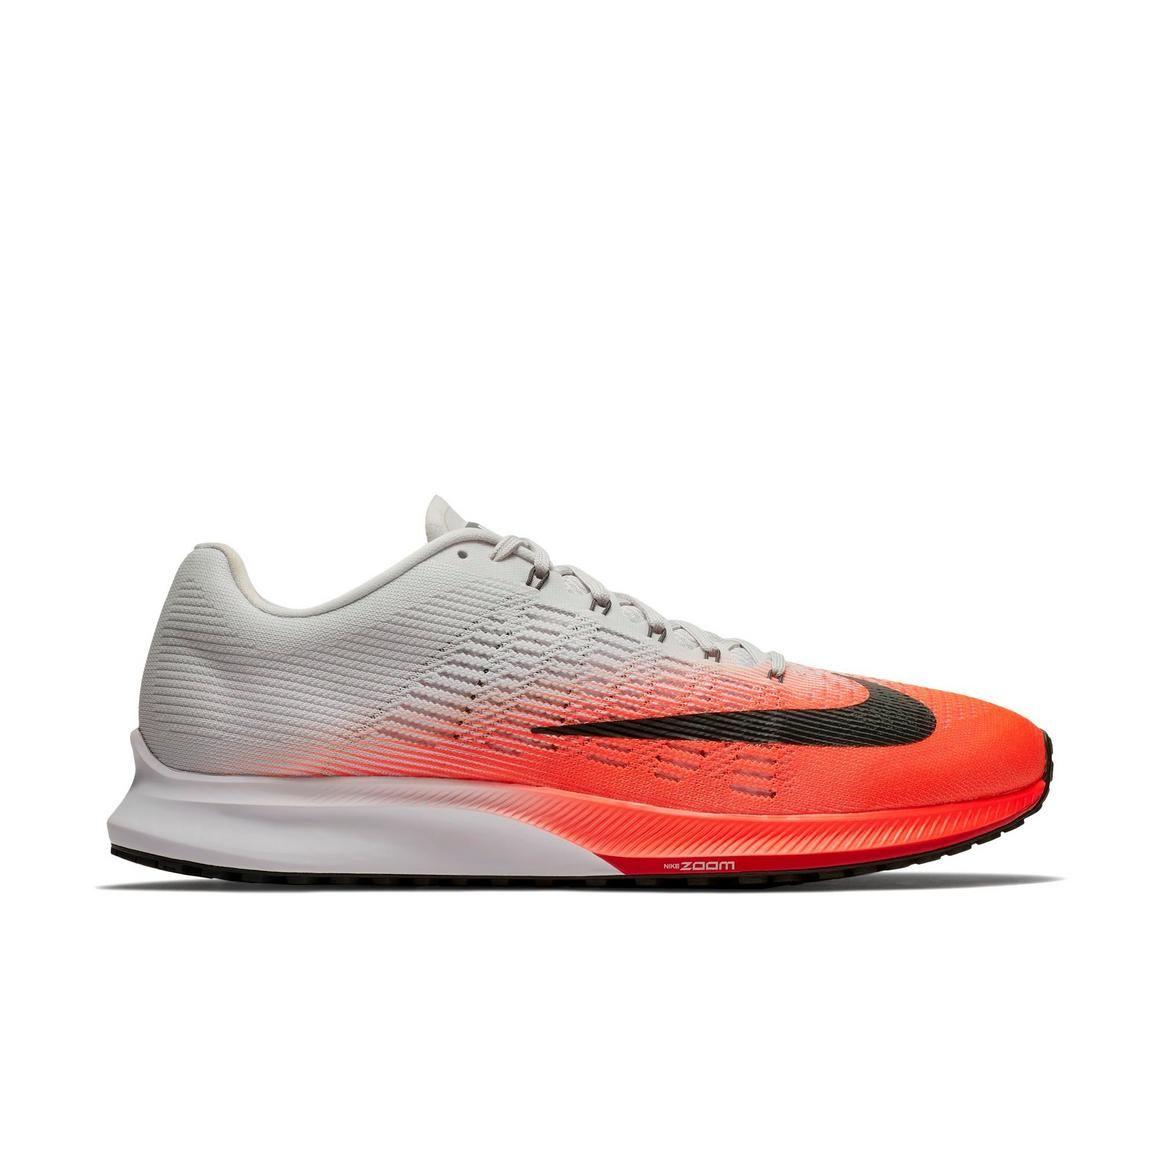 "Nike Air Zoom Elite 9 ""Red/Grey"" Men's Running Shoe"